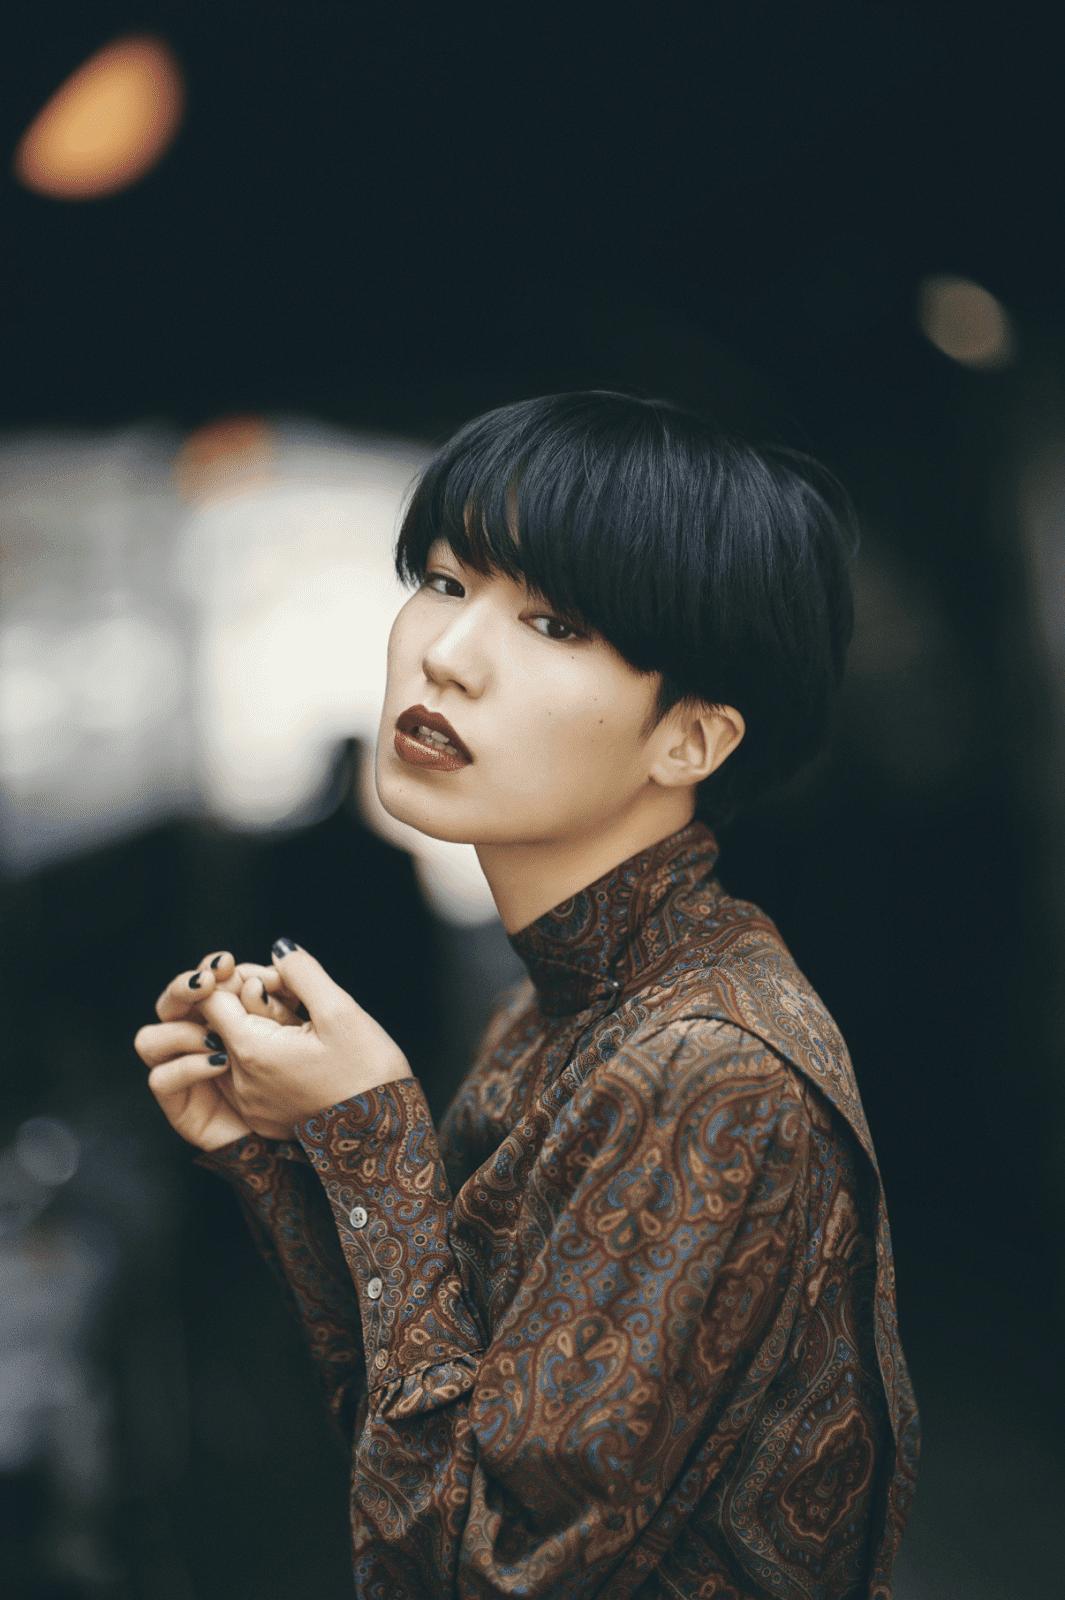 Asian woman emotion